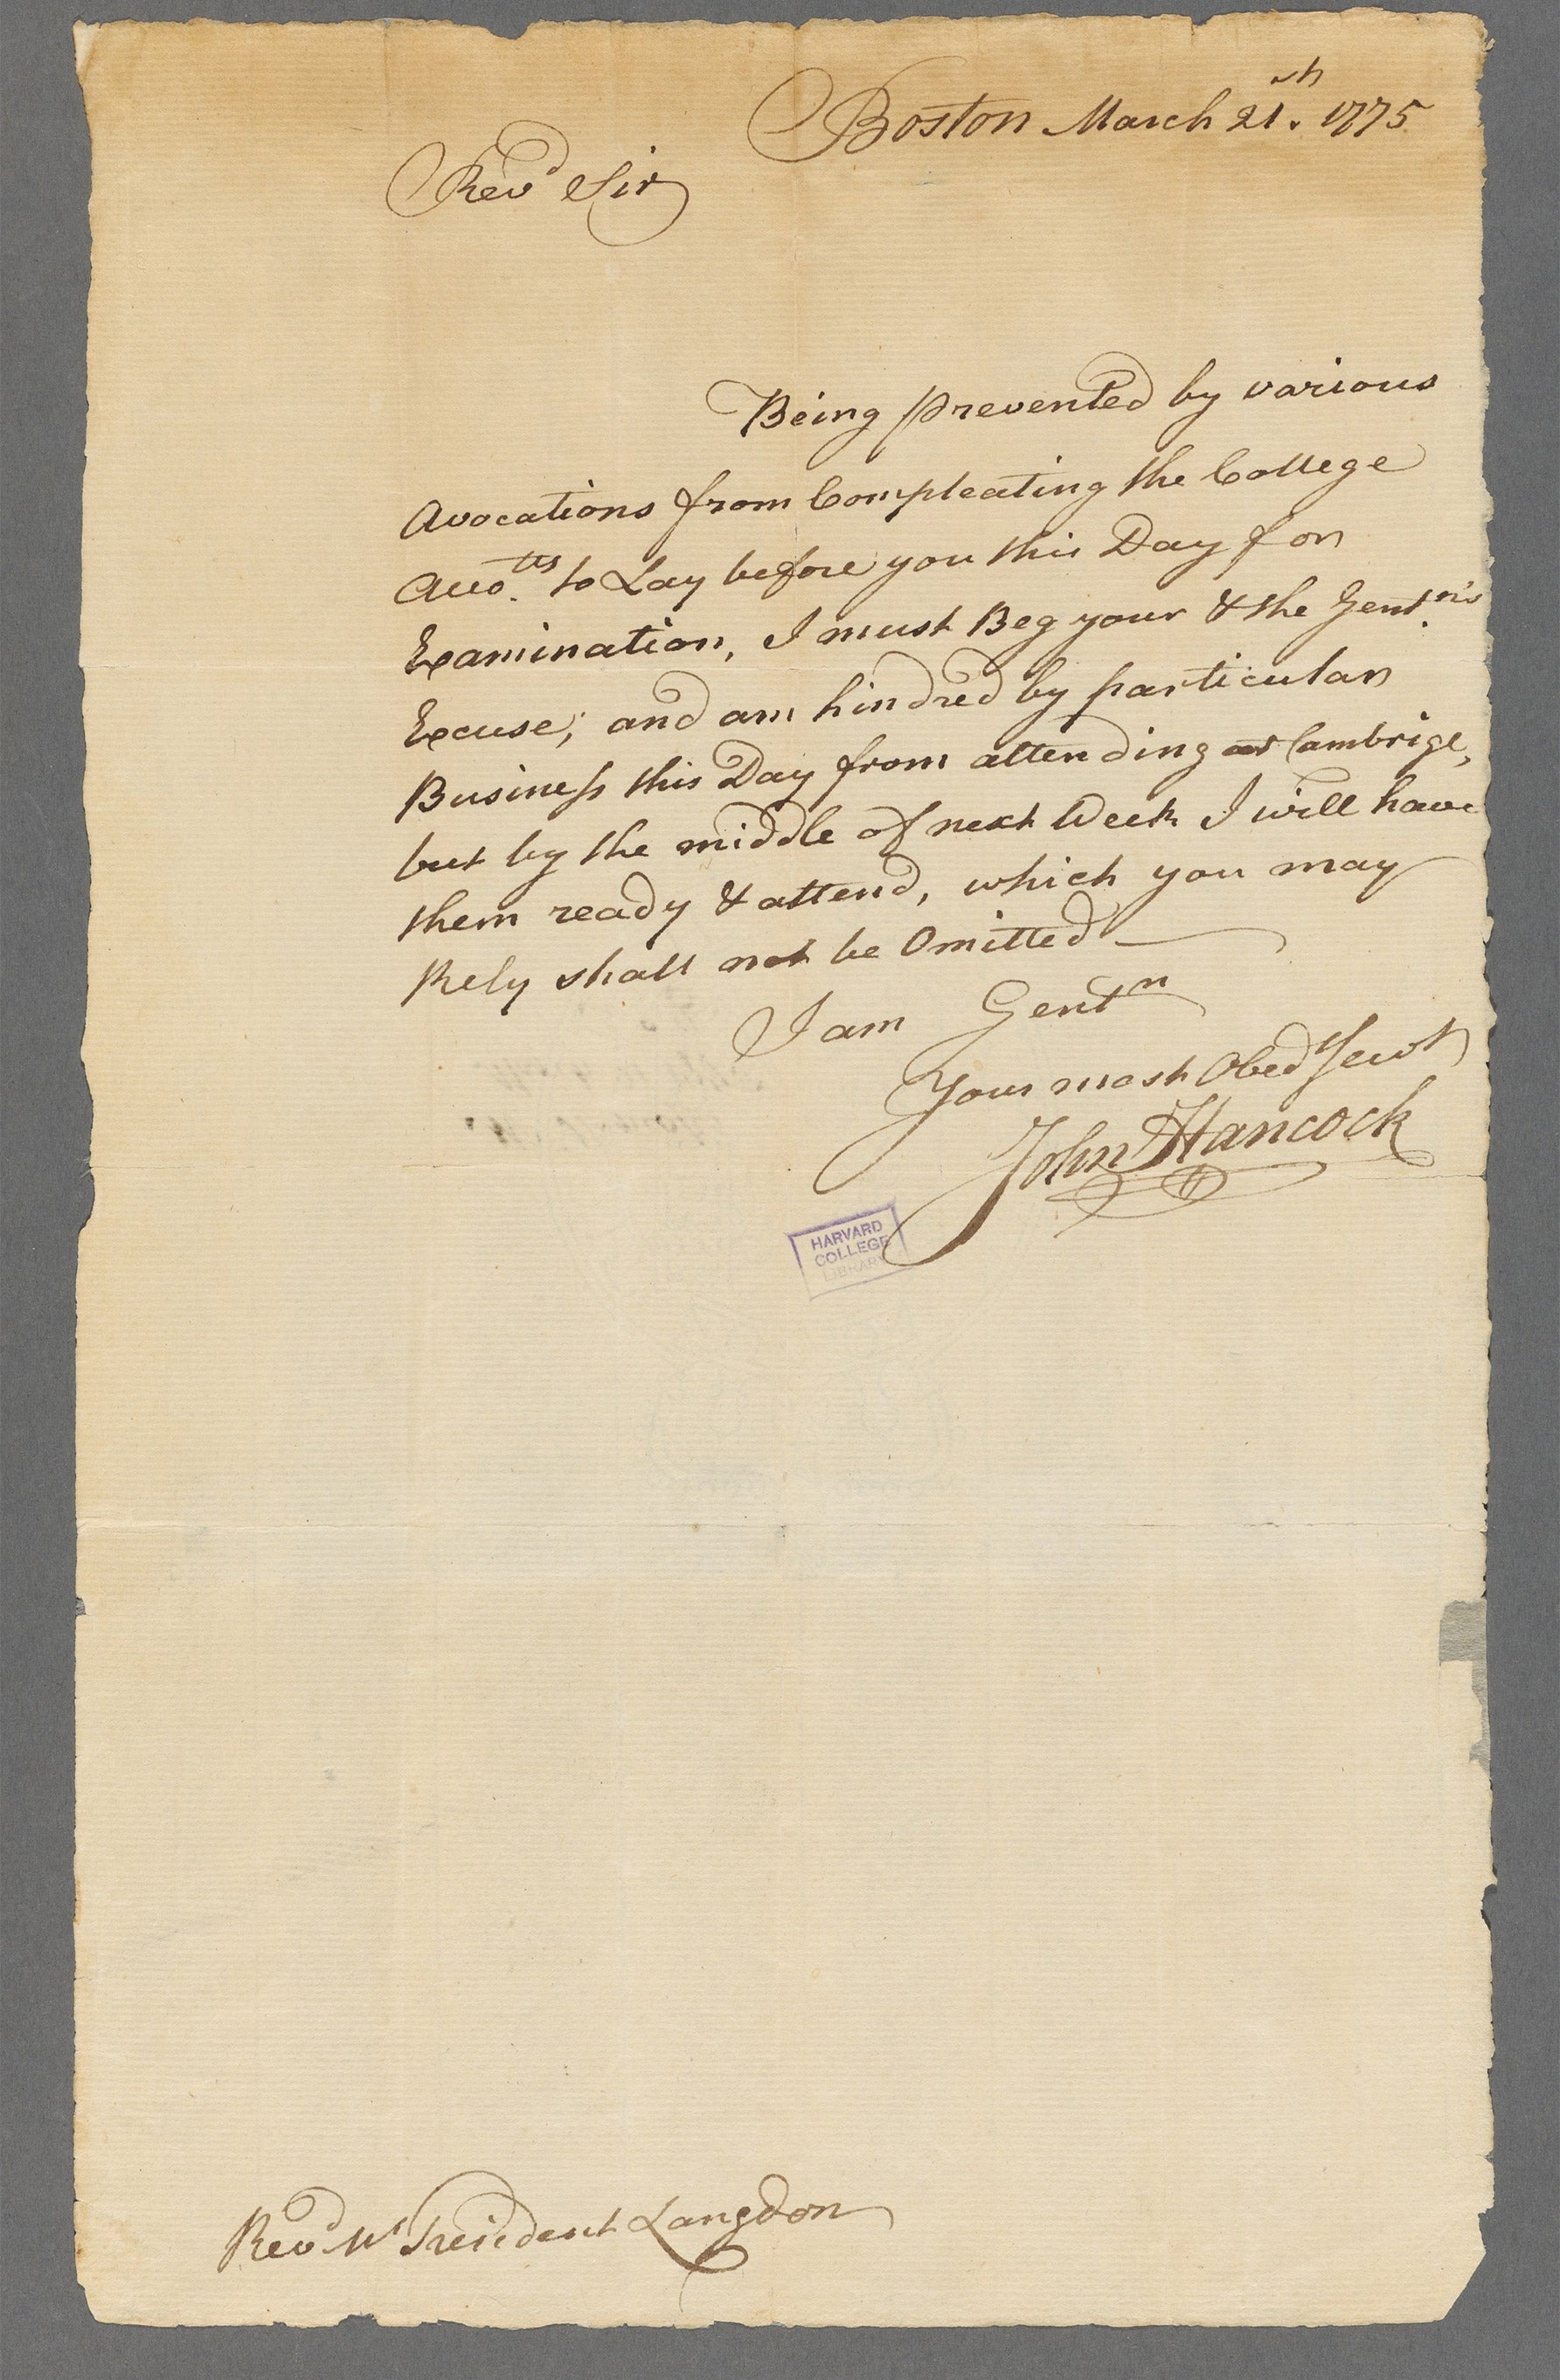 Hancock's signature.